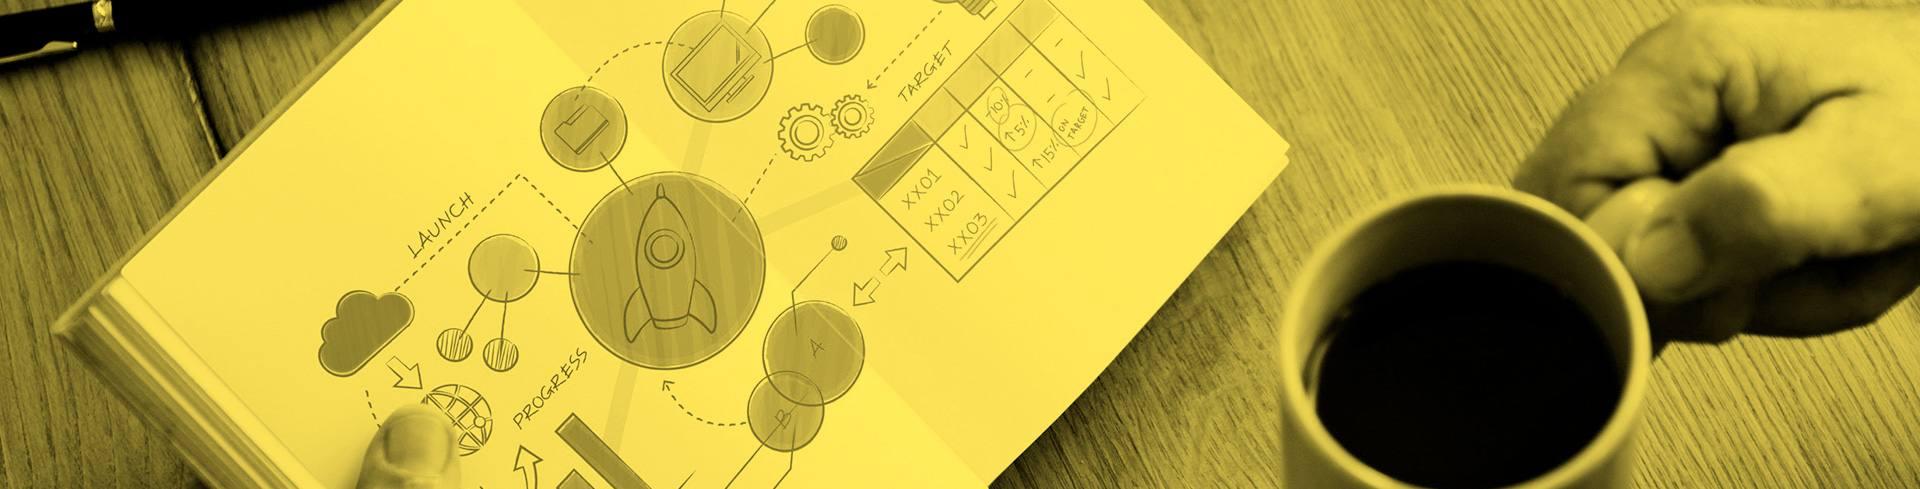 Curso Diseño de información para contar historias